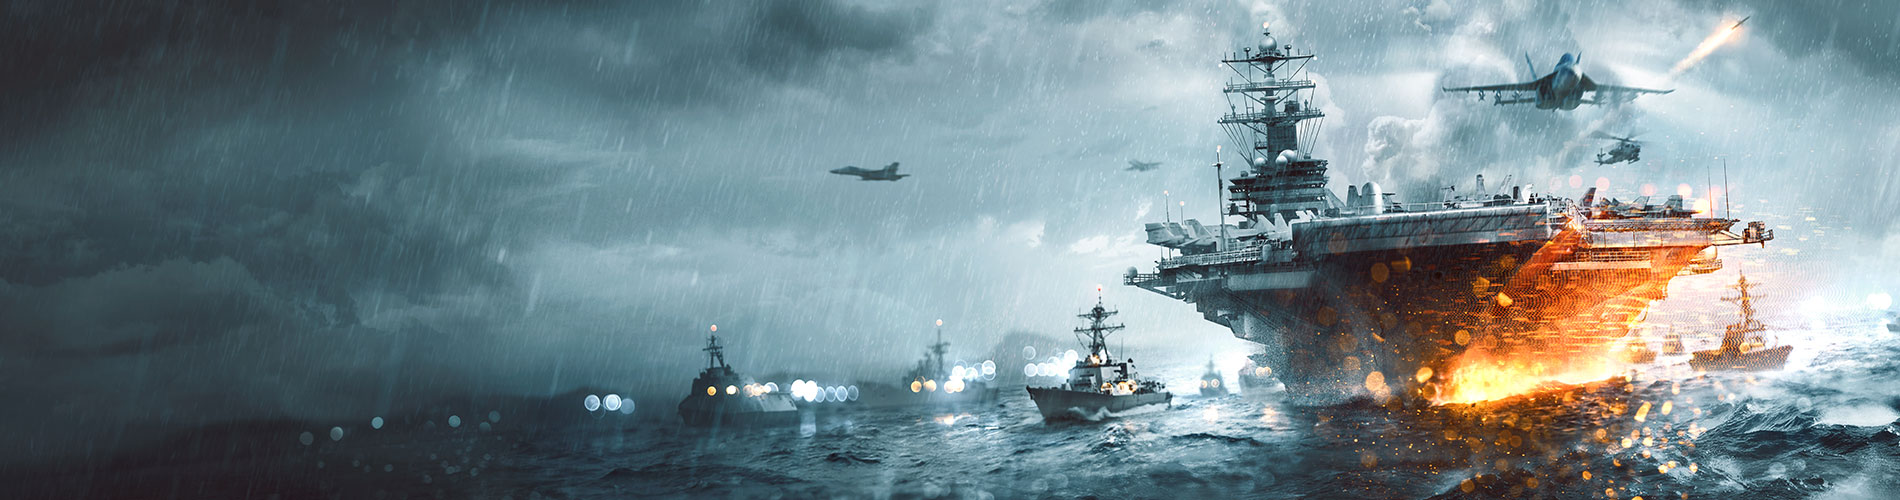 Detaily o Naval Strike DLC k Battlefieldu 4 94031